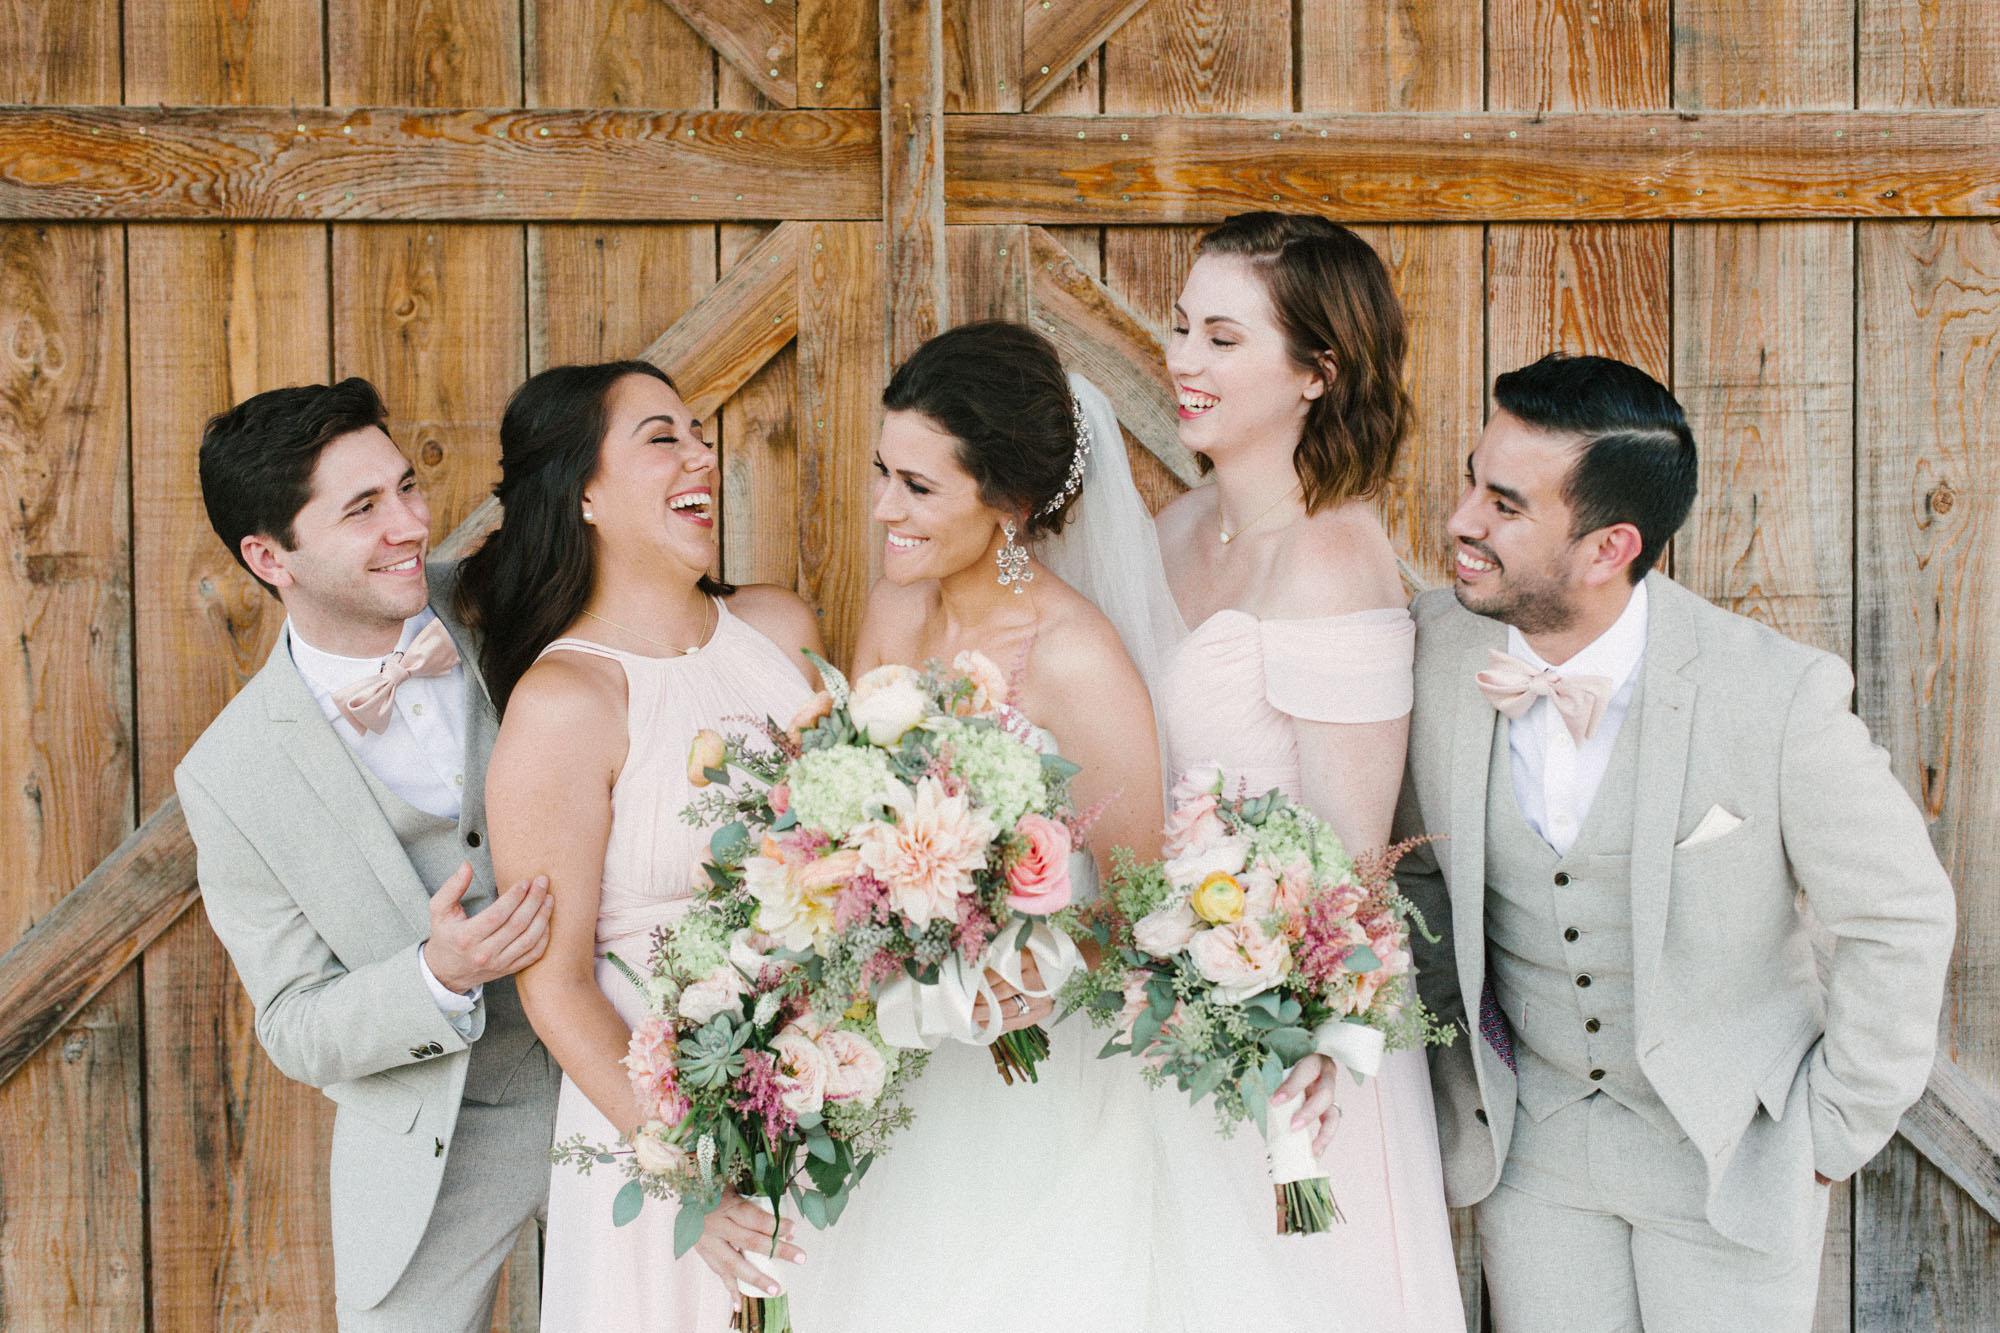 SM anna smith photography wedding photographer venue wedding planner-693.jpg